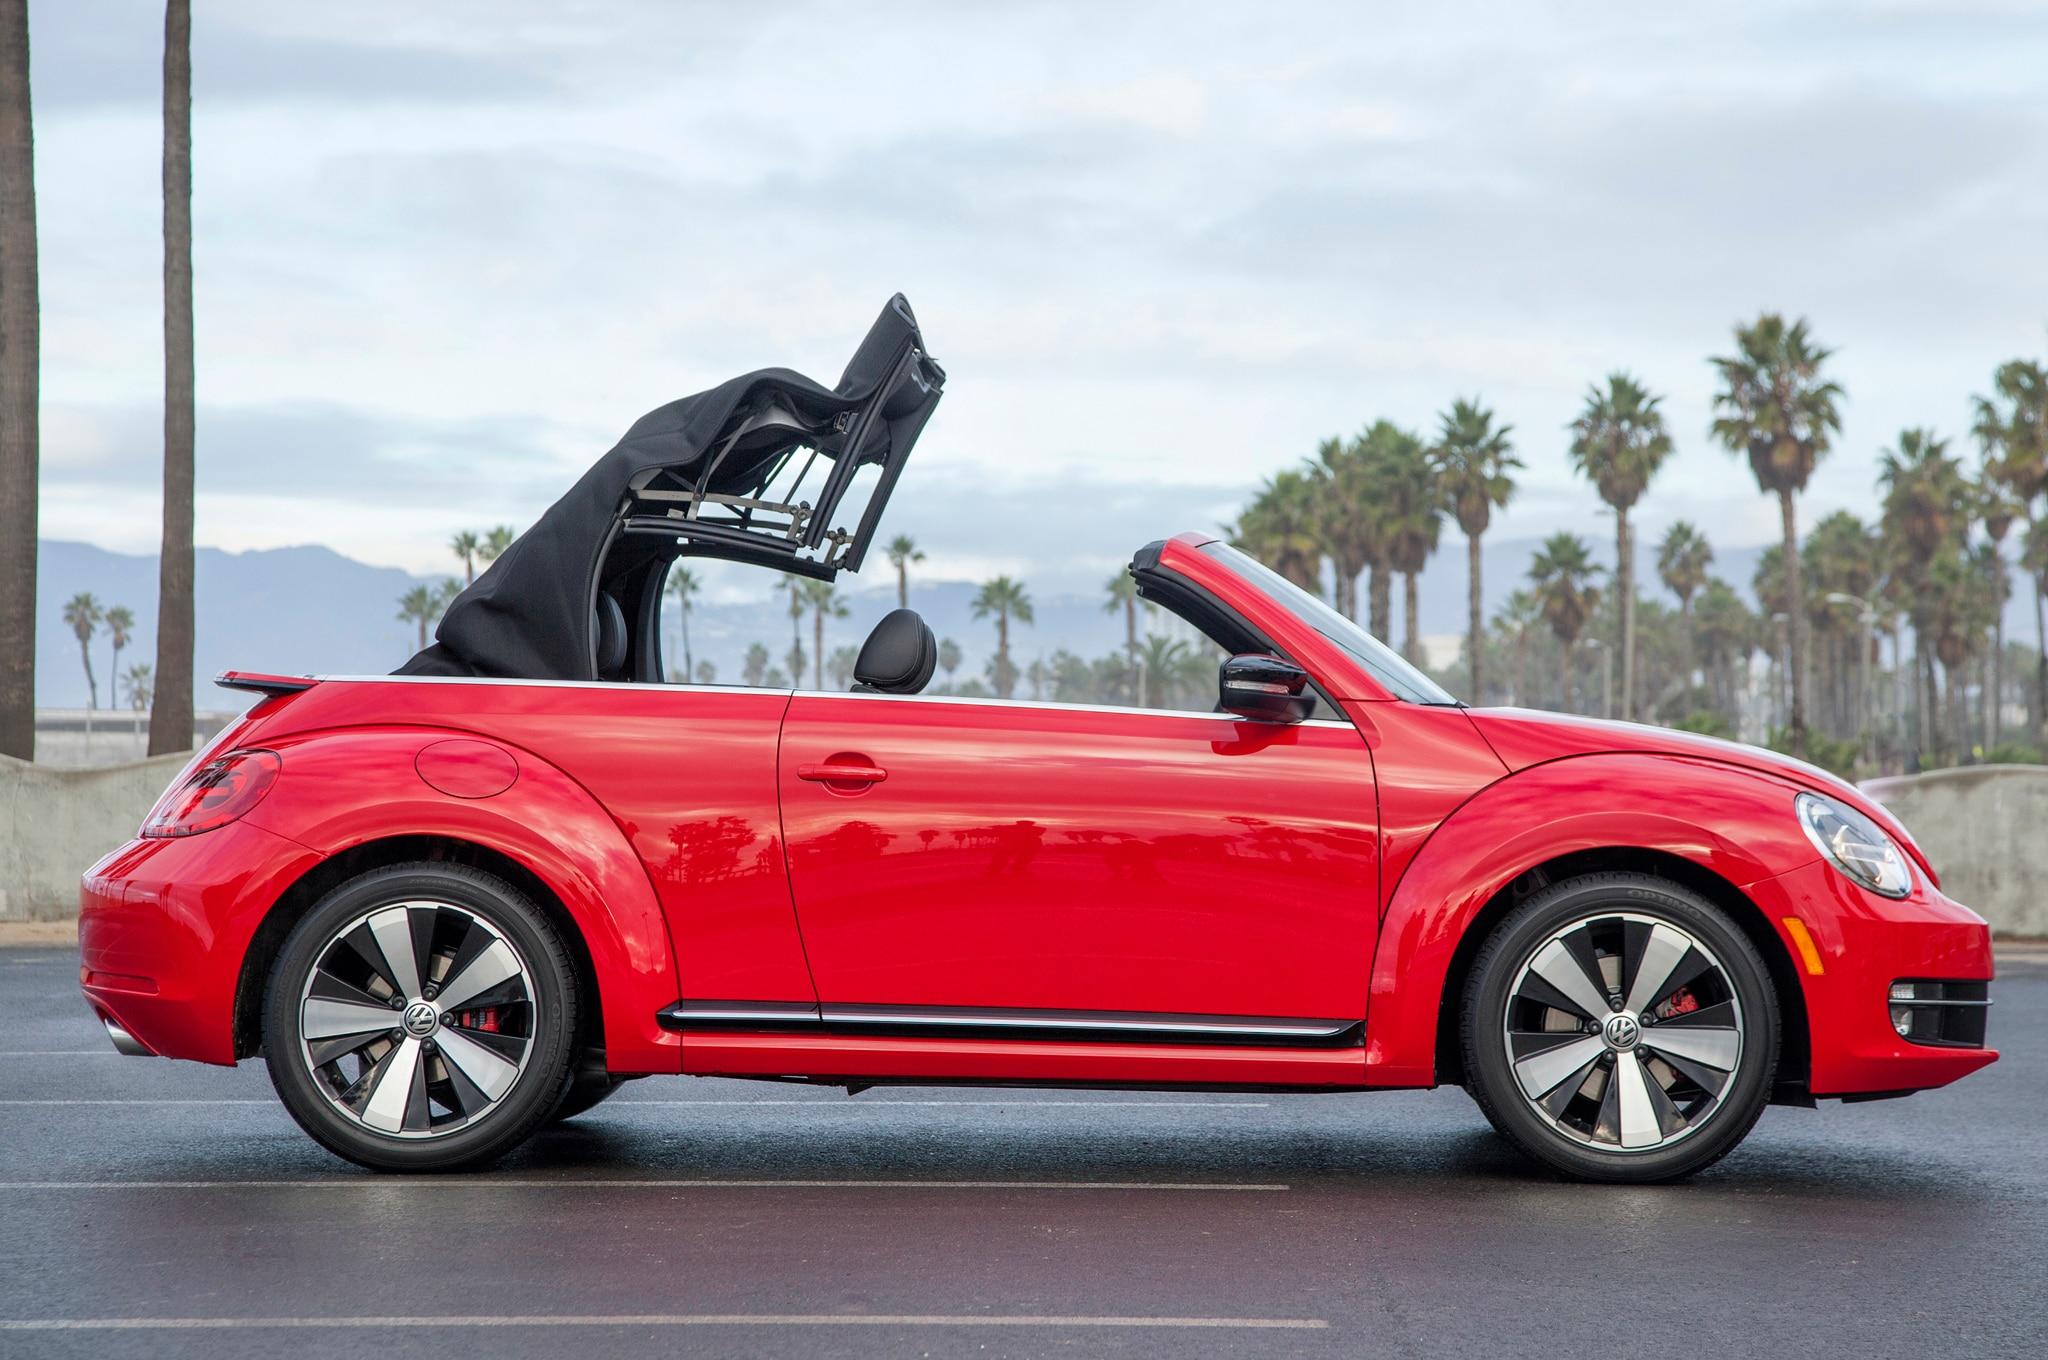 2013 volkswagen beetle gsr and r line convertible first. Black Bedroom Furniture Sets. Home Design Ideas